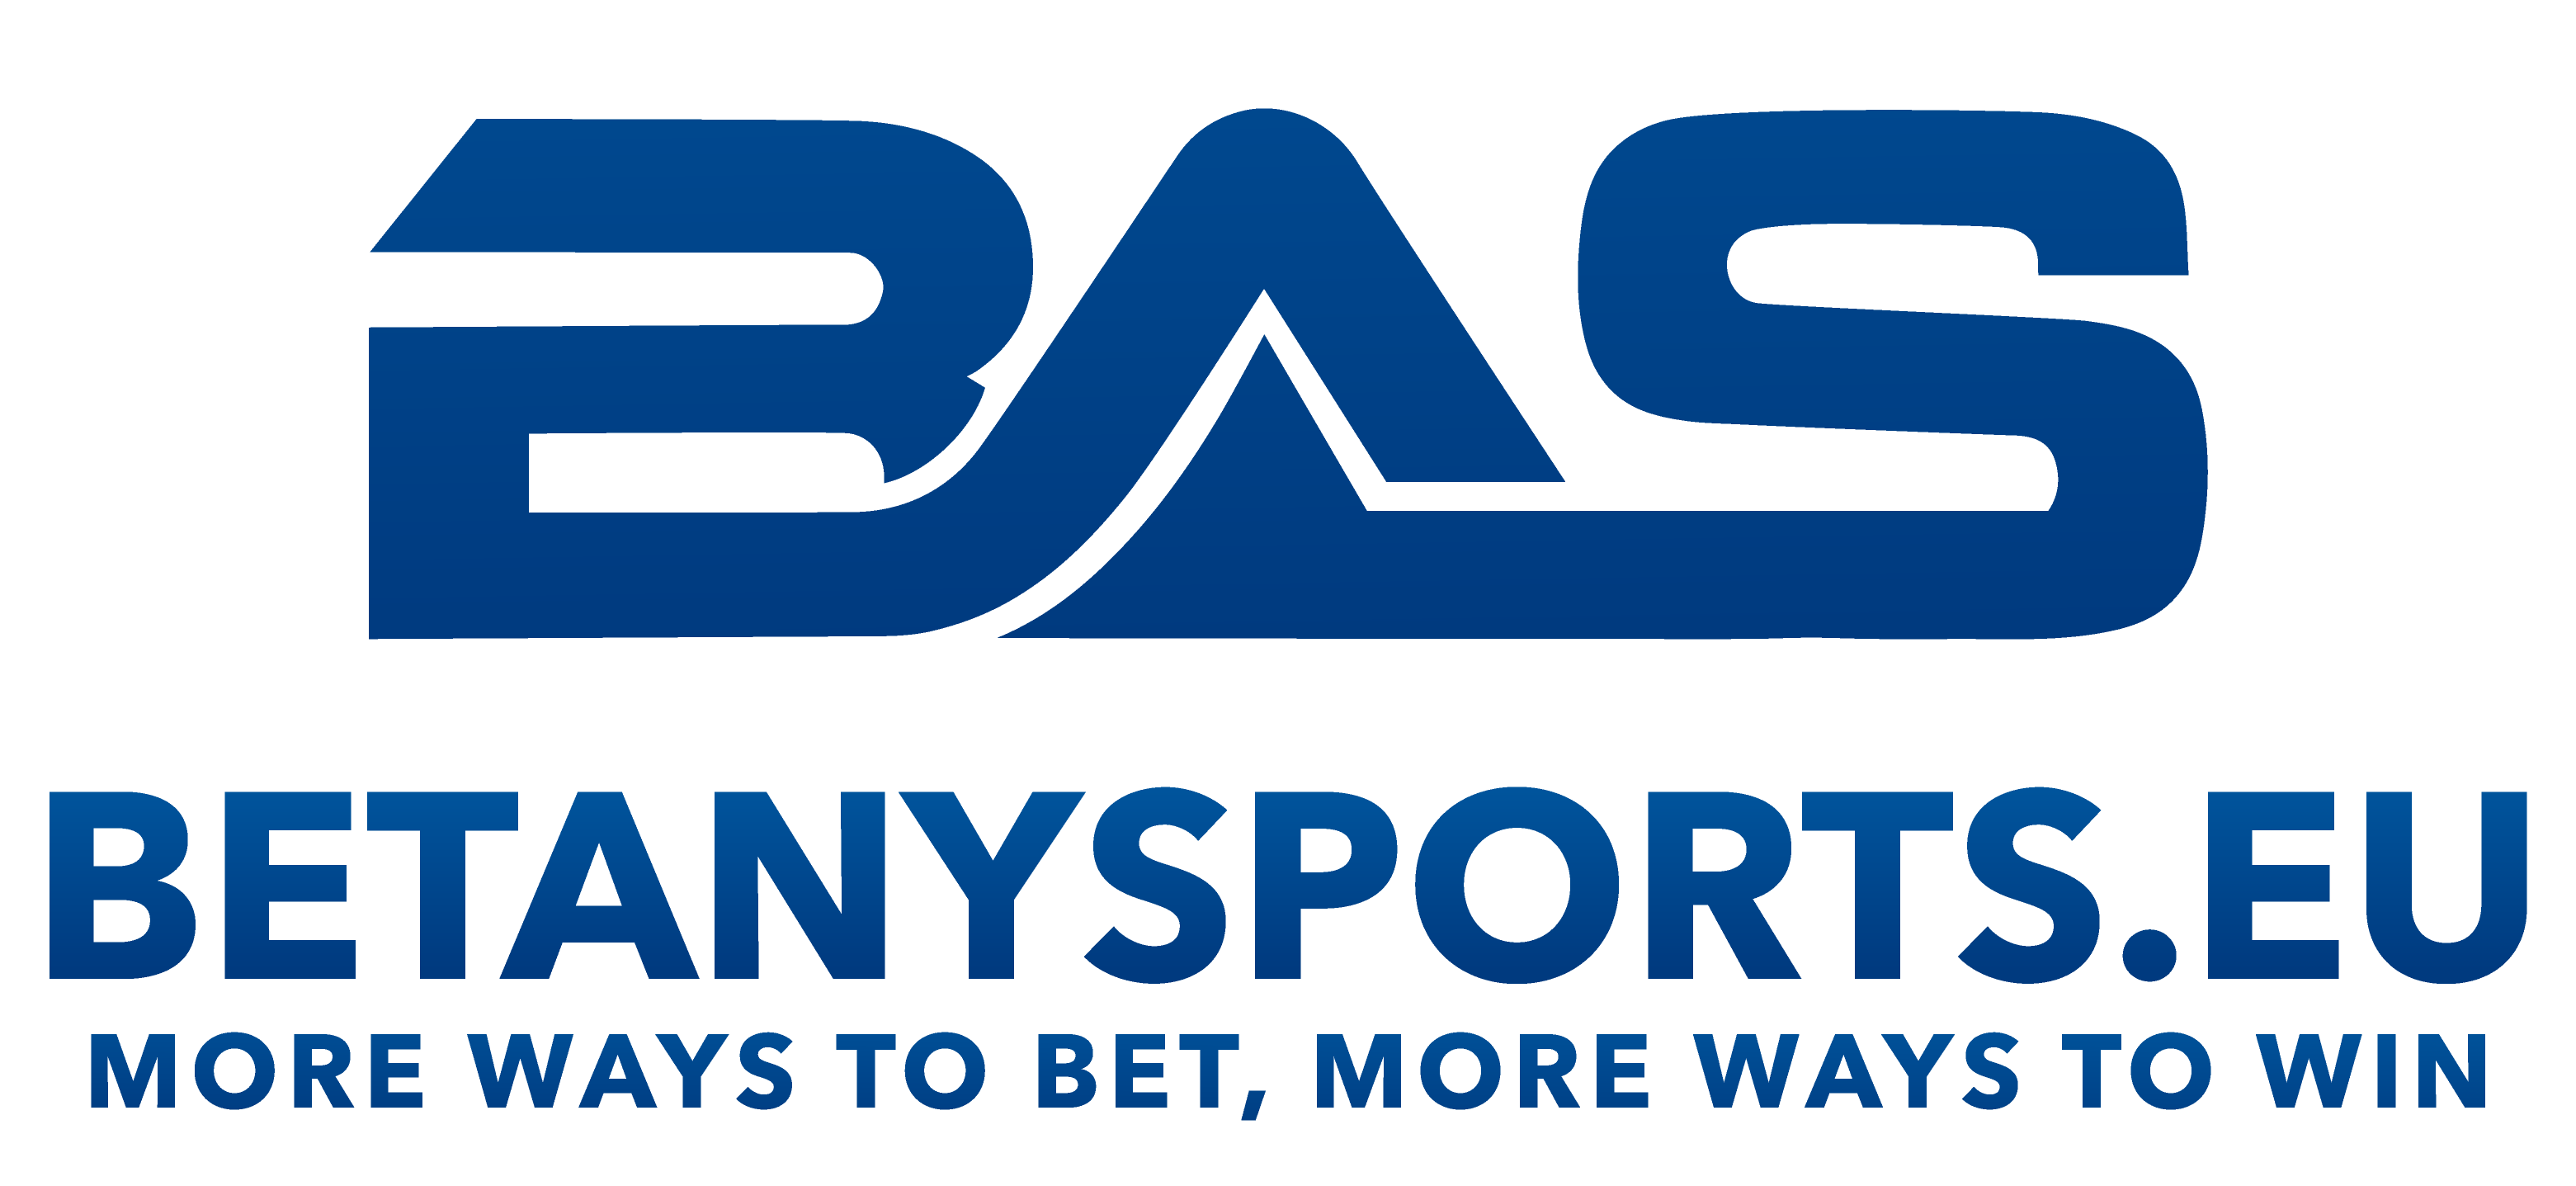 #1 BetAnySports Sportsbook